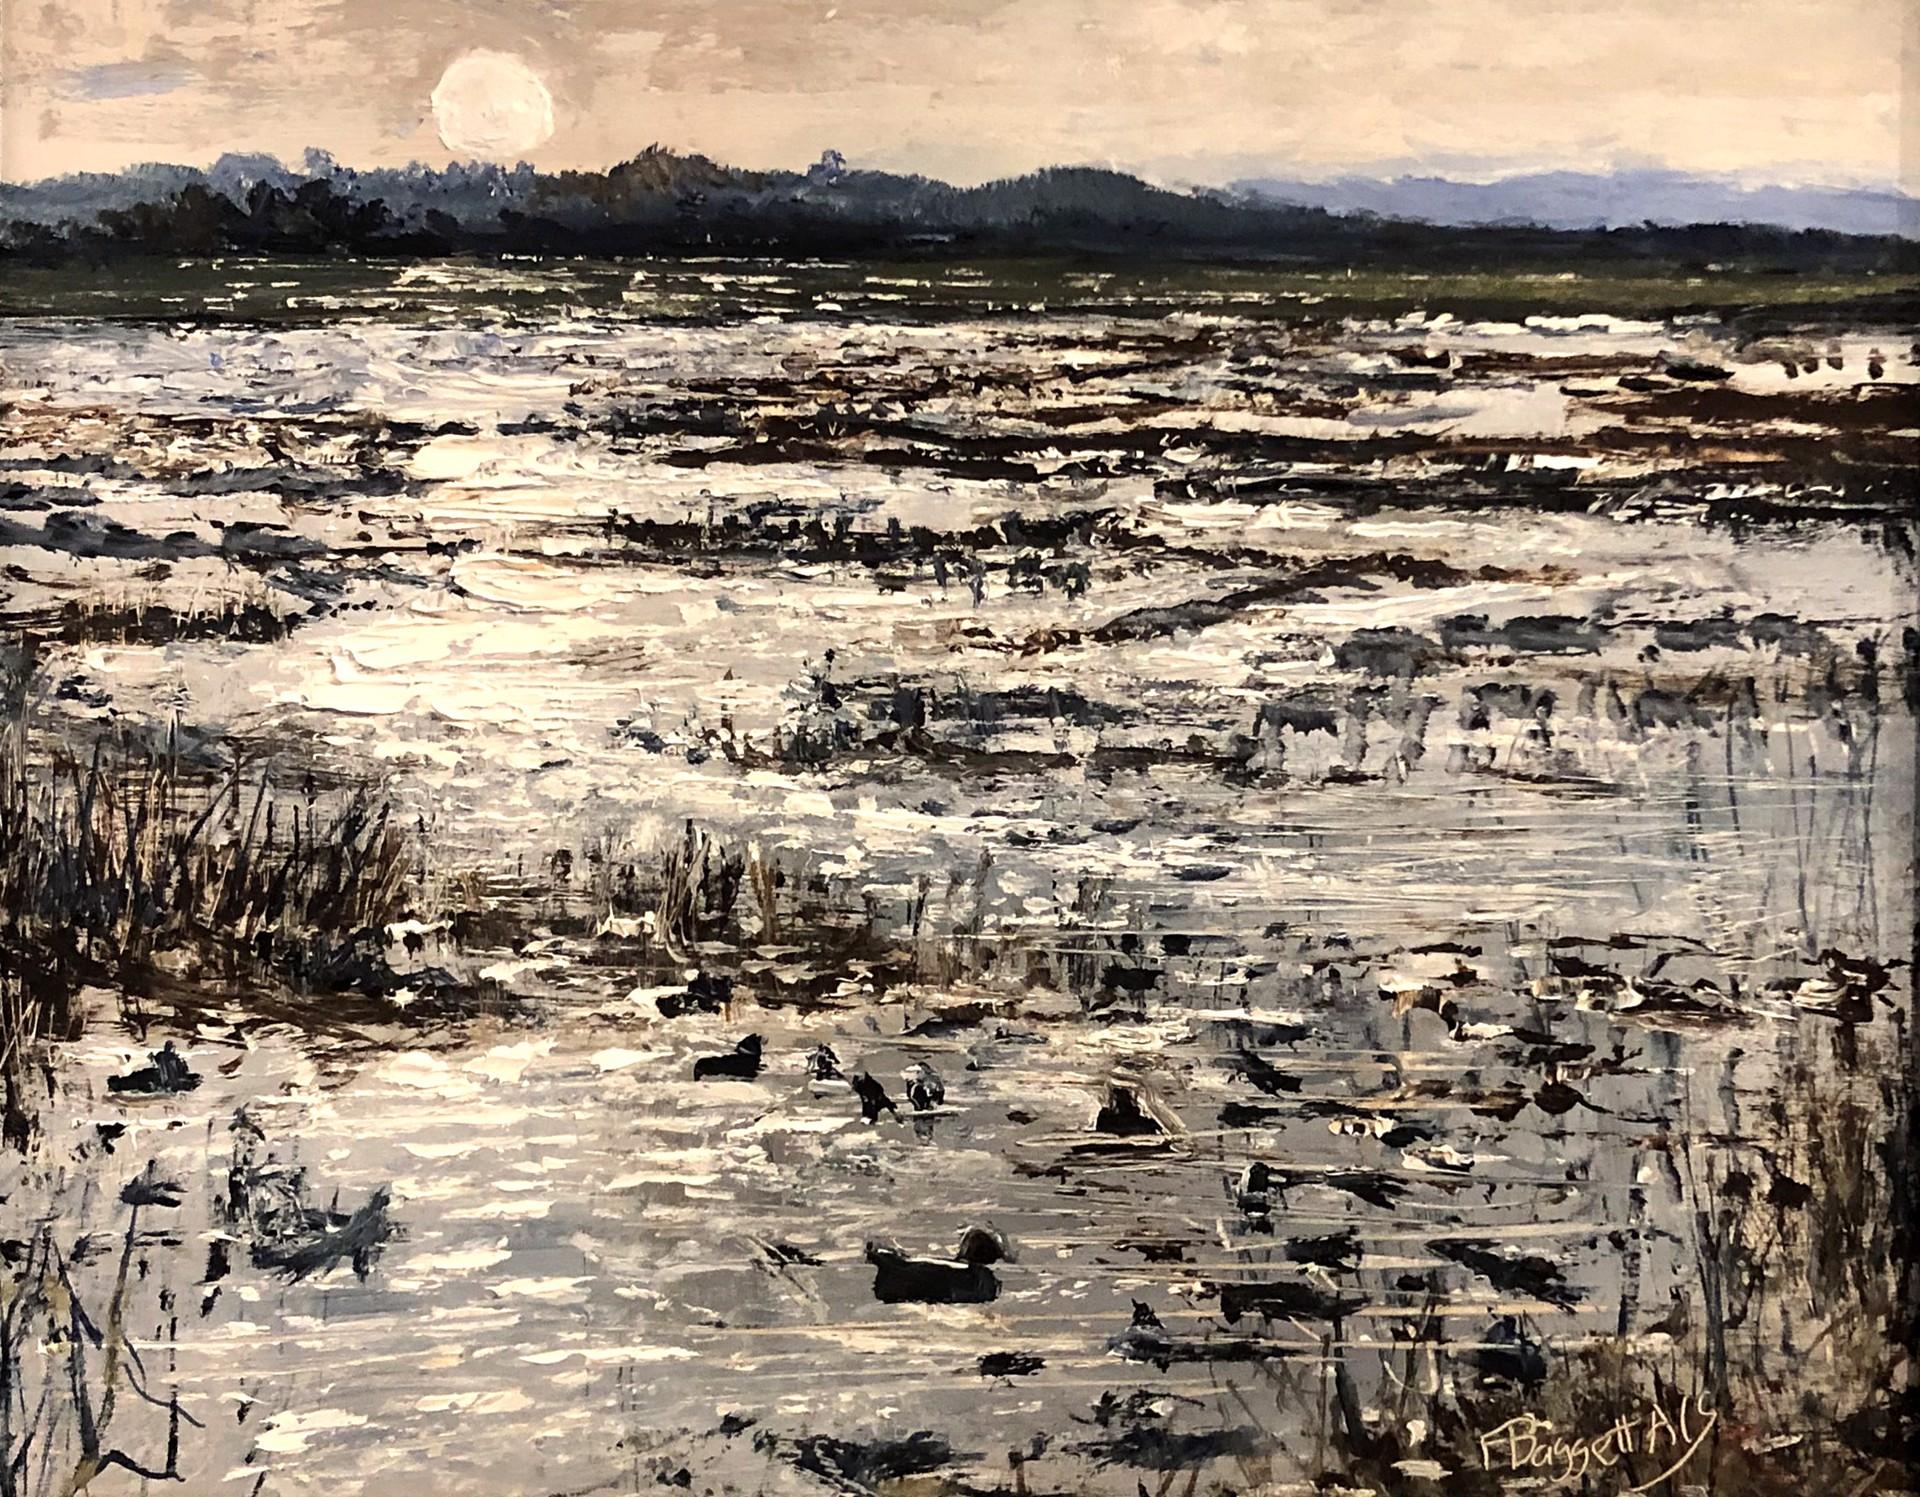 Moonlit Marsh by Frank Baggett